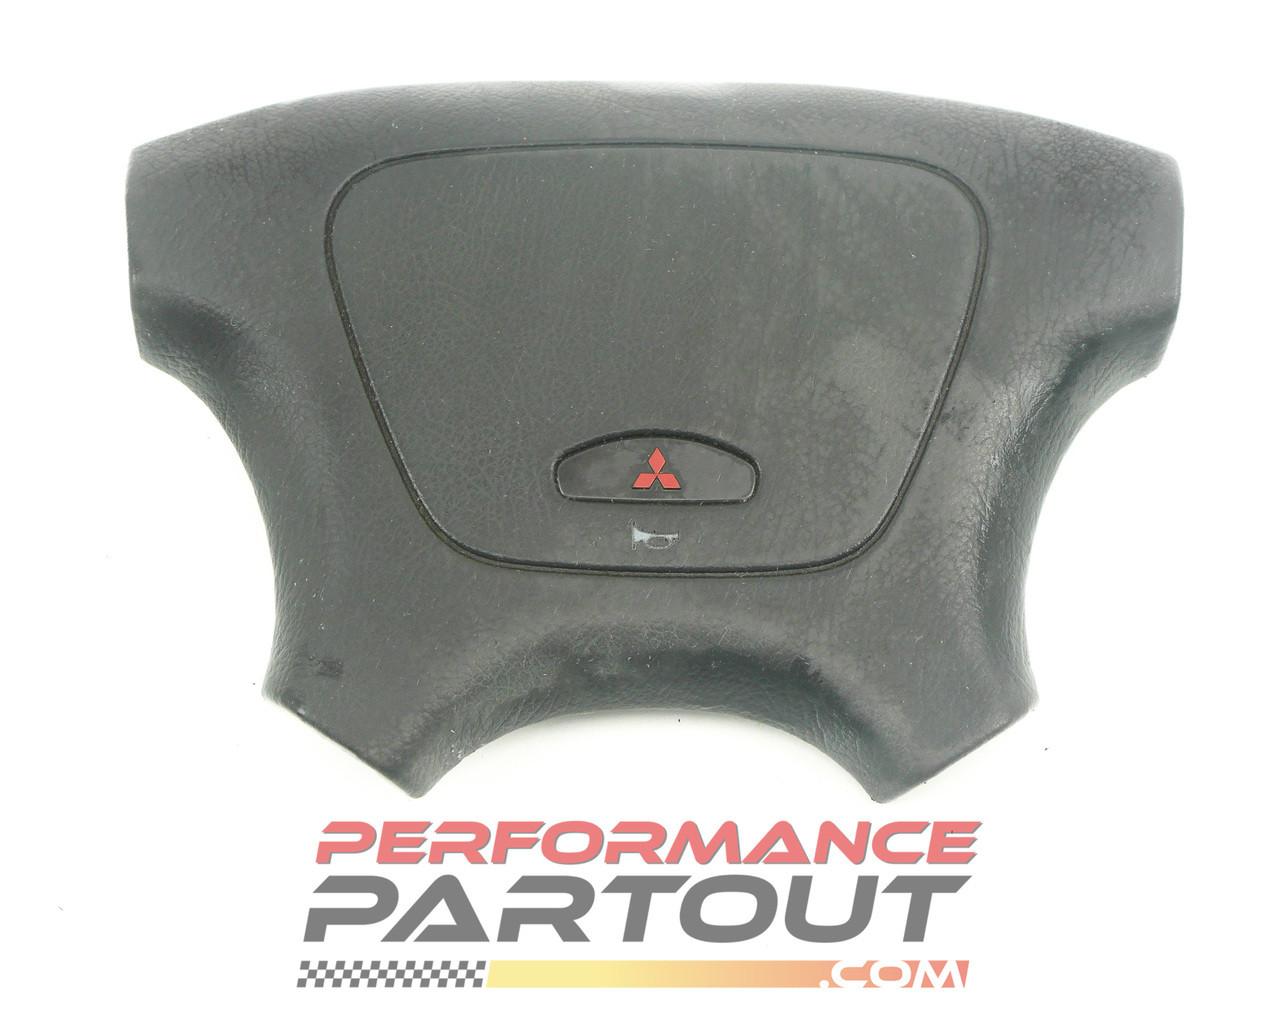 Horn pad GVR4